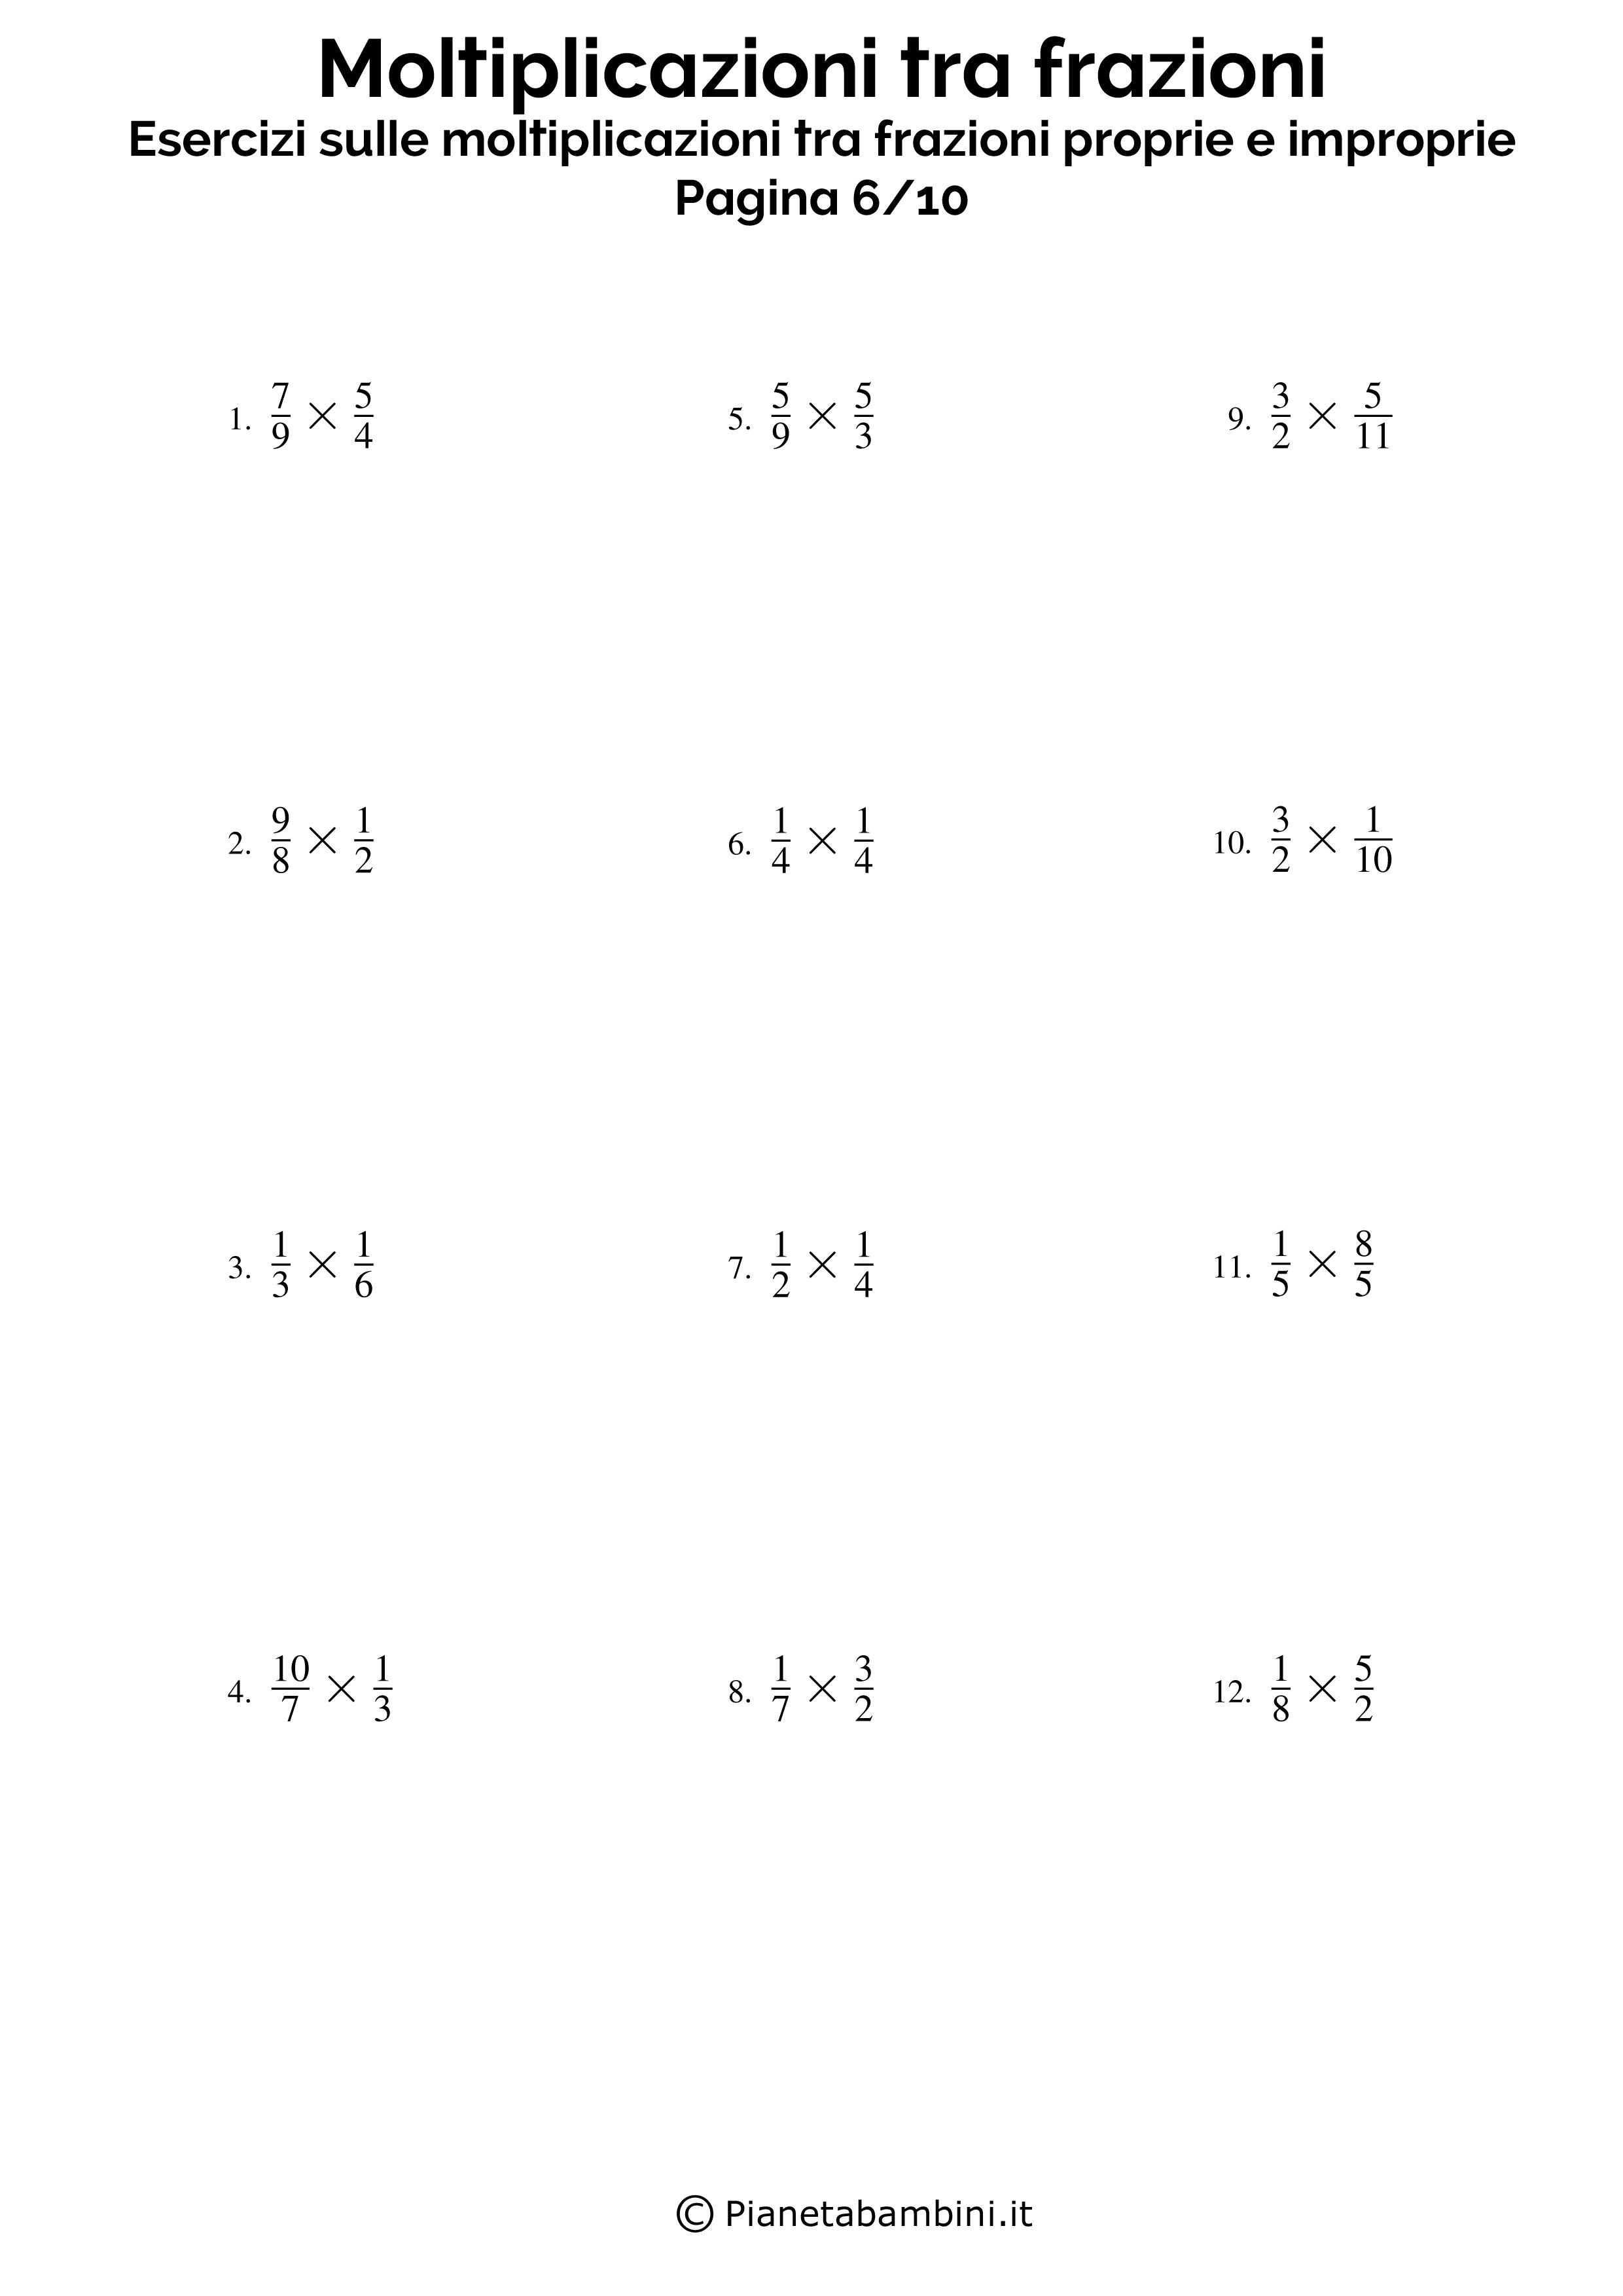 Moltiplicazioni-Frazioni-Proprie-Improprie_06